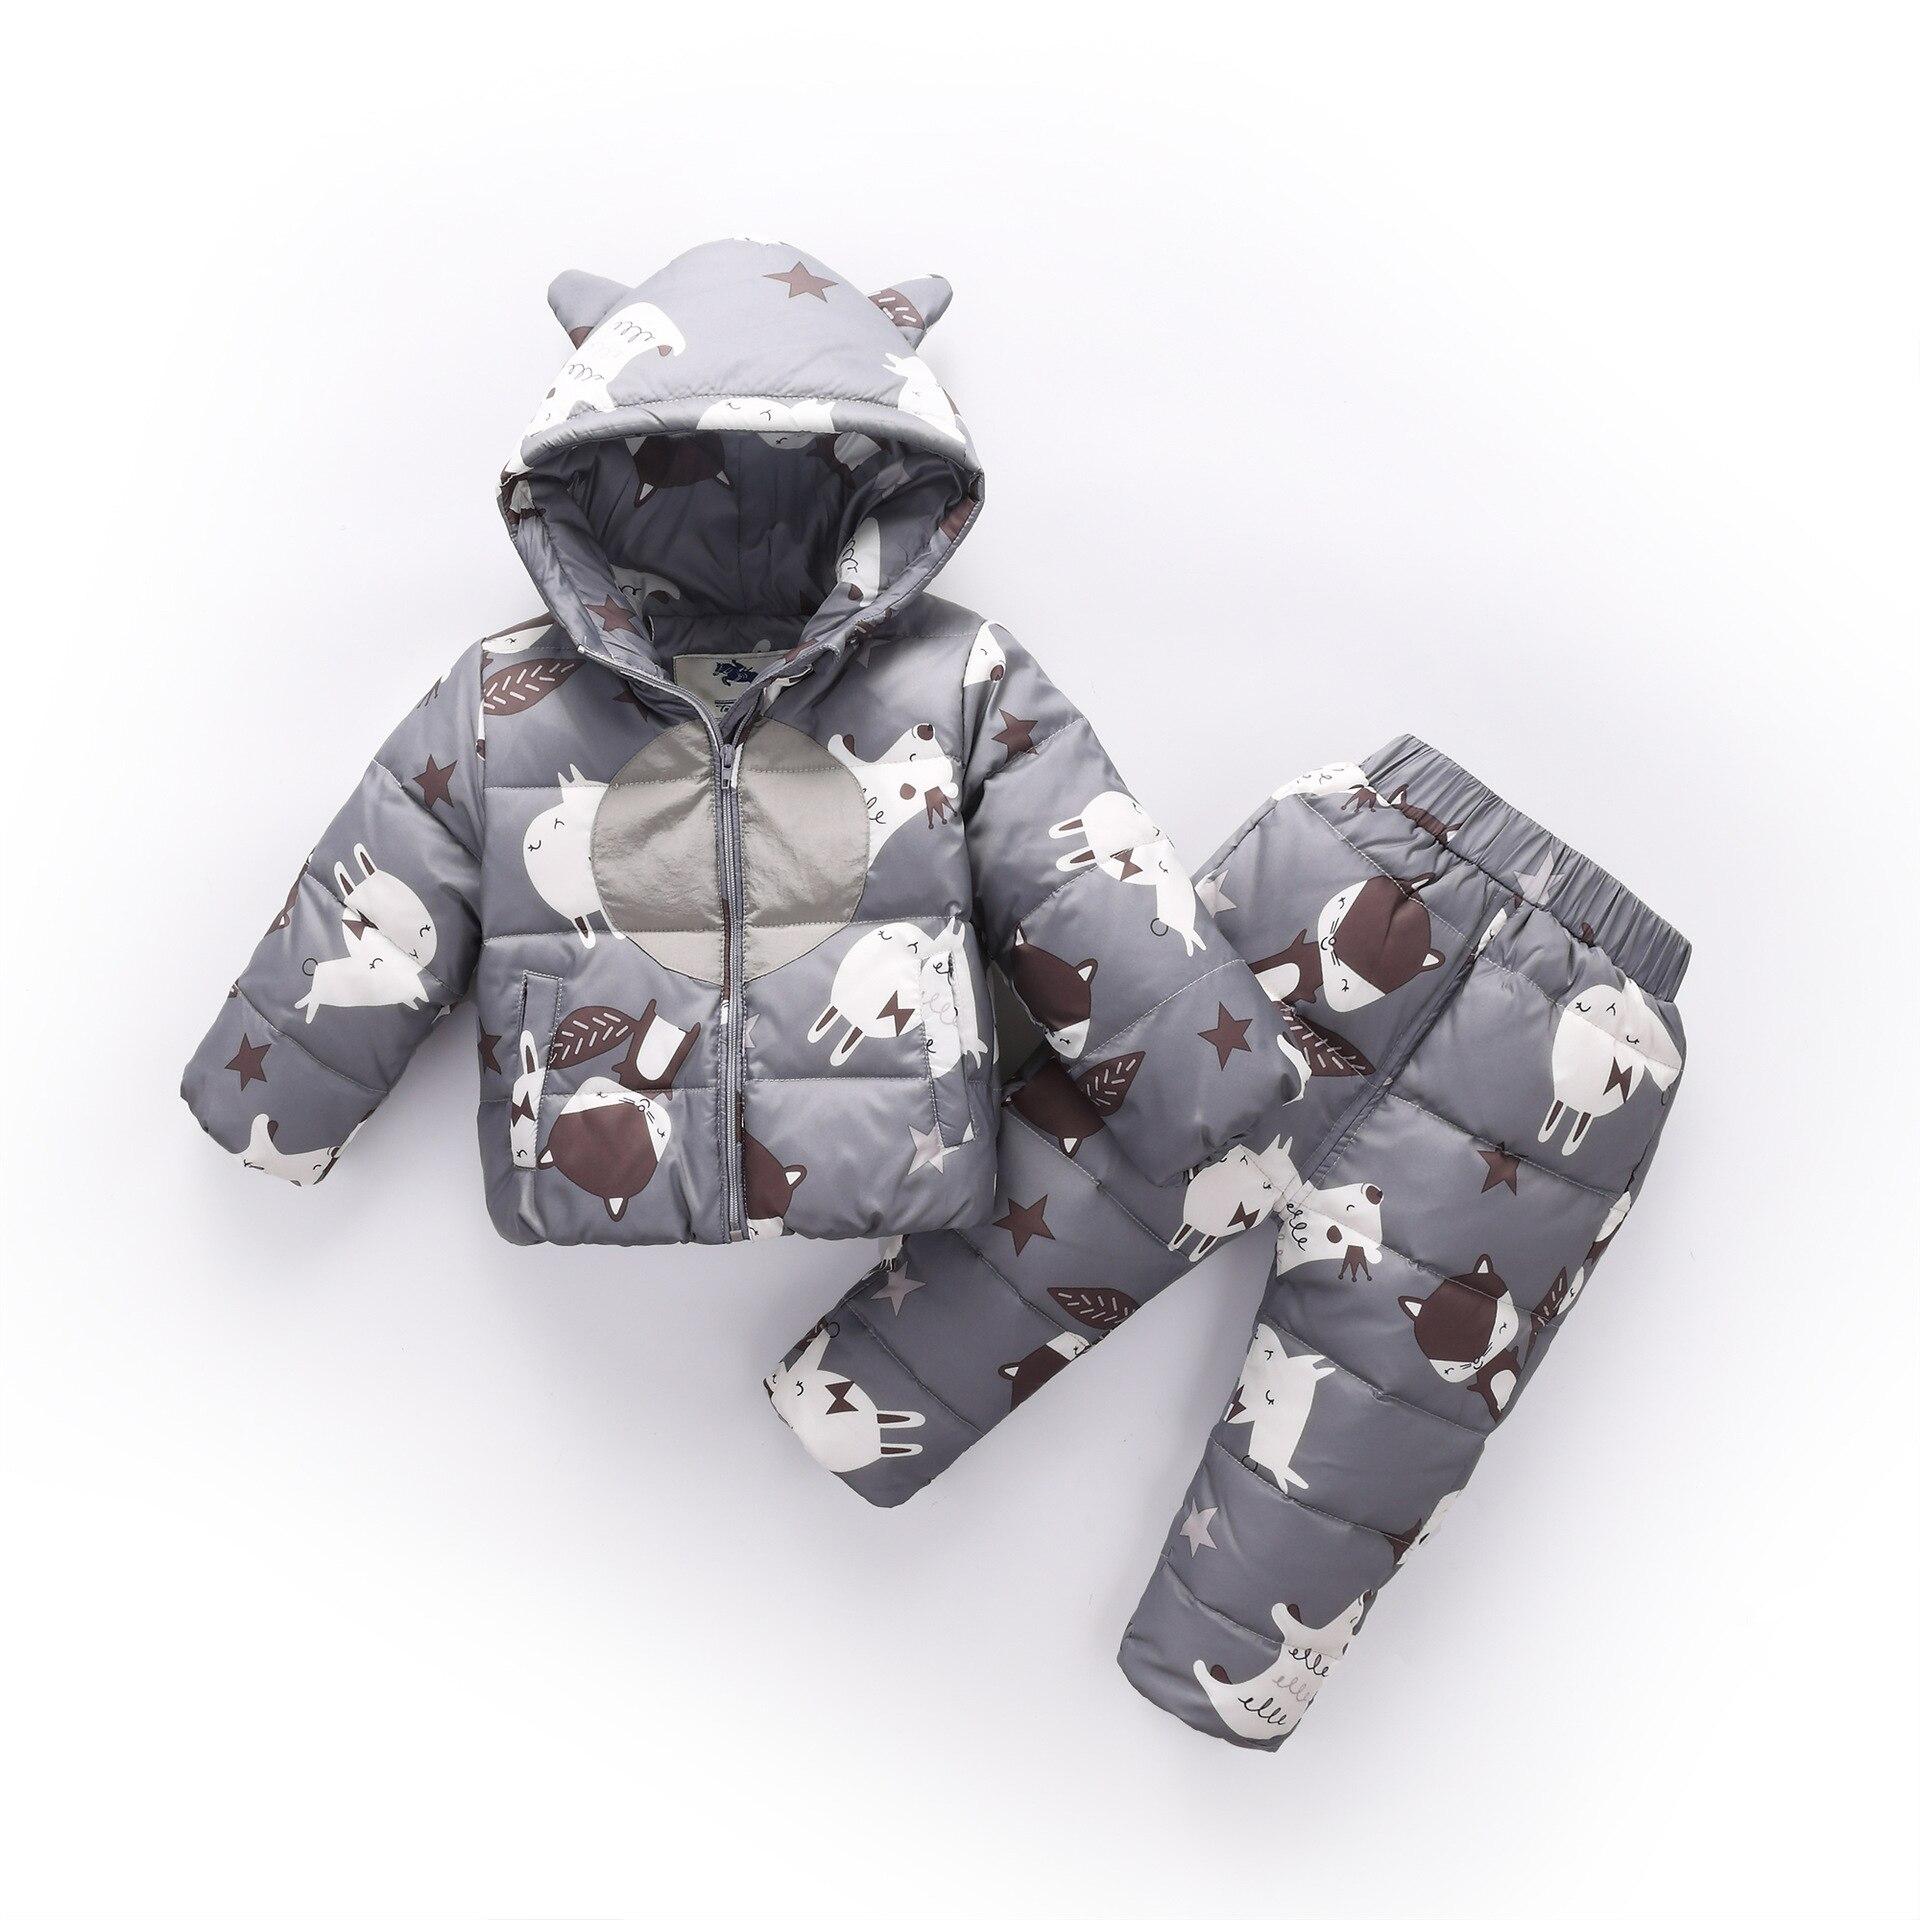 2018 Russian Winter Children Sets Clothing Warm Duck Down Jacket for Baby Boy Girl Children's Coat Snow Wear Kids Suit 1-3Years цена